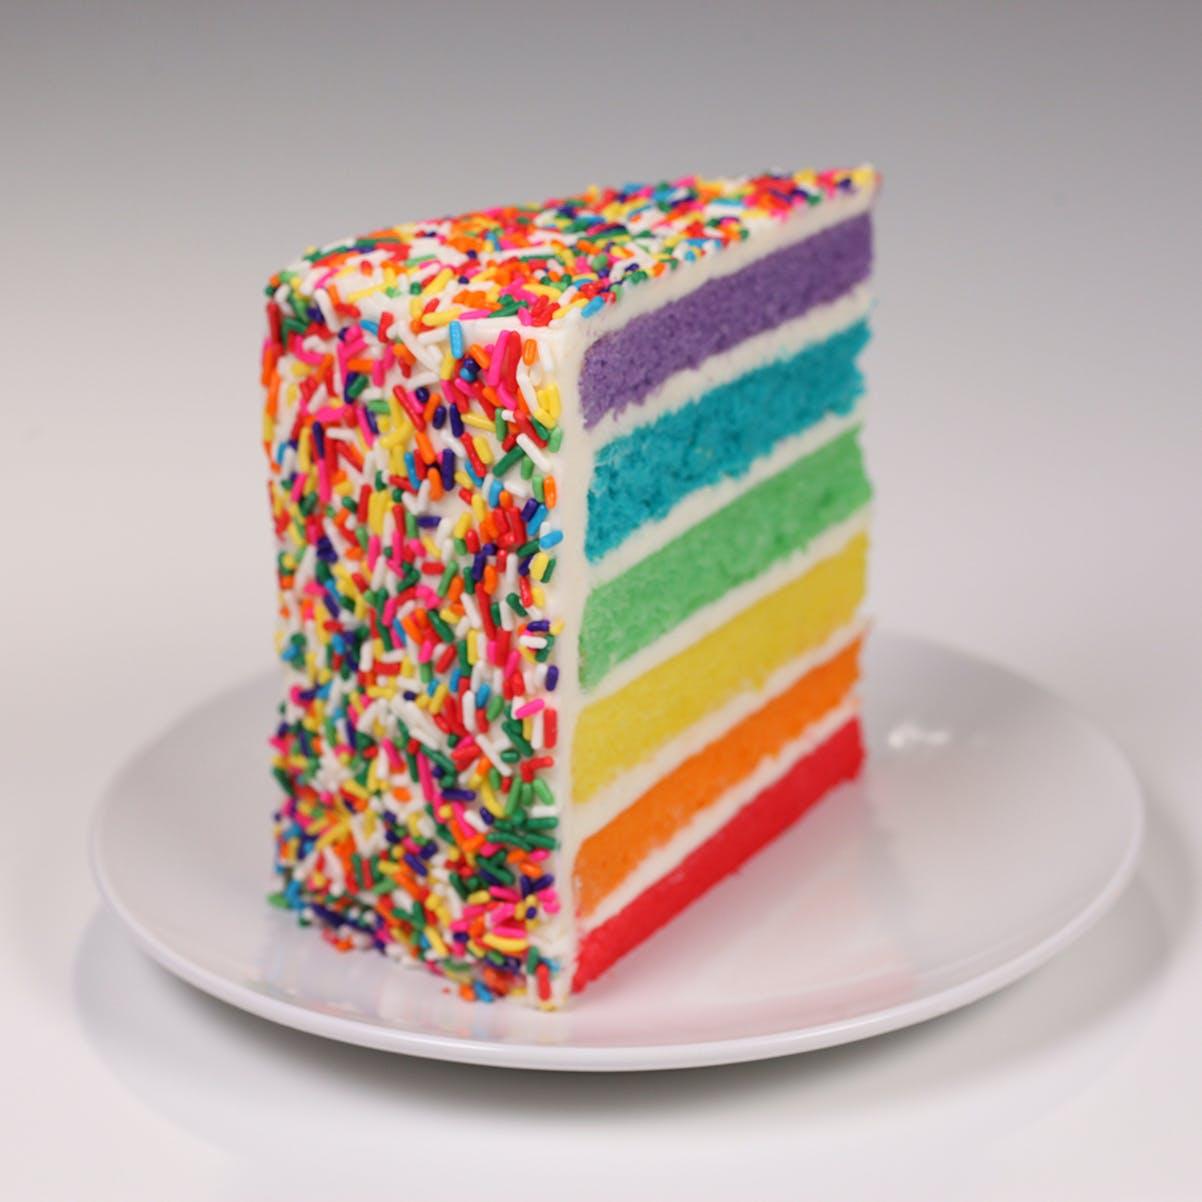 Remarkable Rainbow Cake By Carlos Bakery Goldbelly Funny Birthday Cards Online Amentibdeldamsfinfo